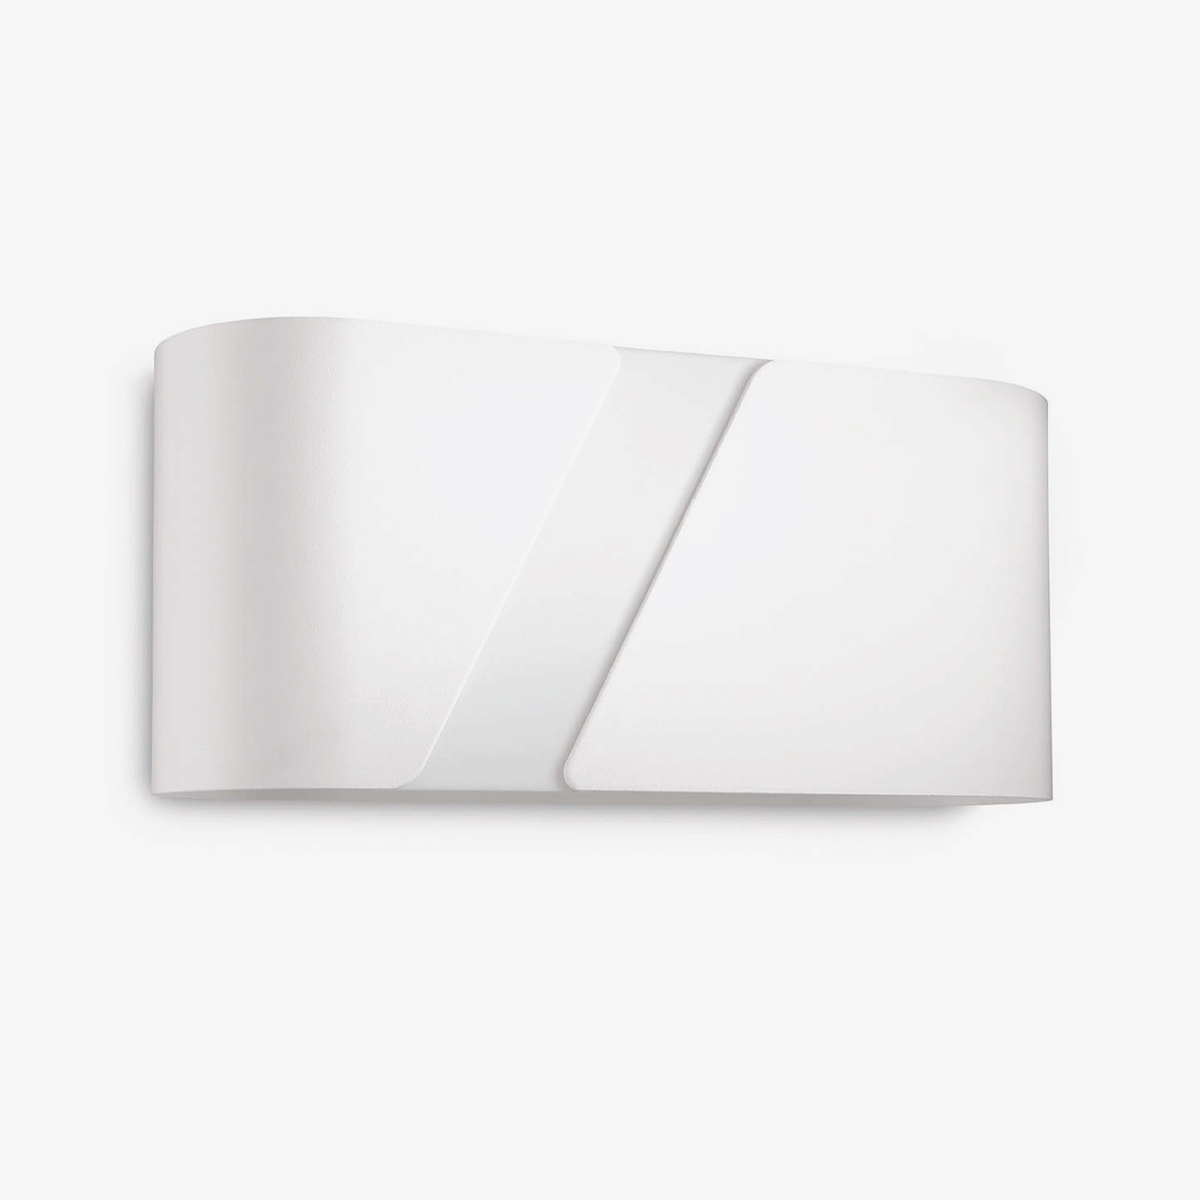 Aplique de pared Gainsboro blanco Philips-0